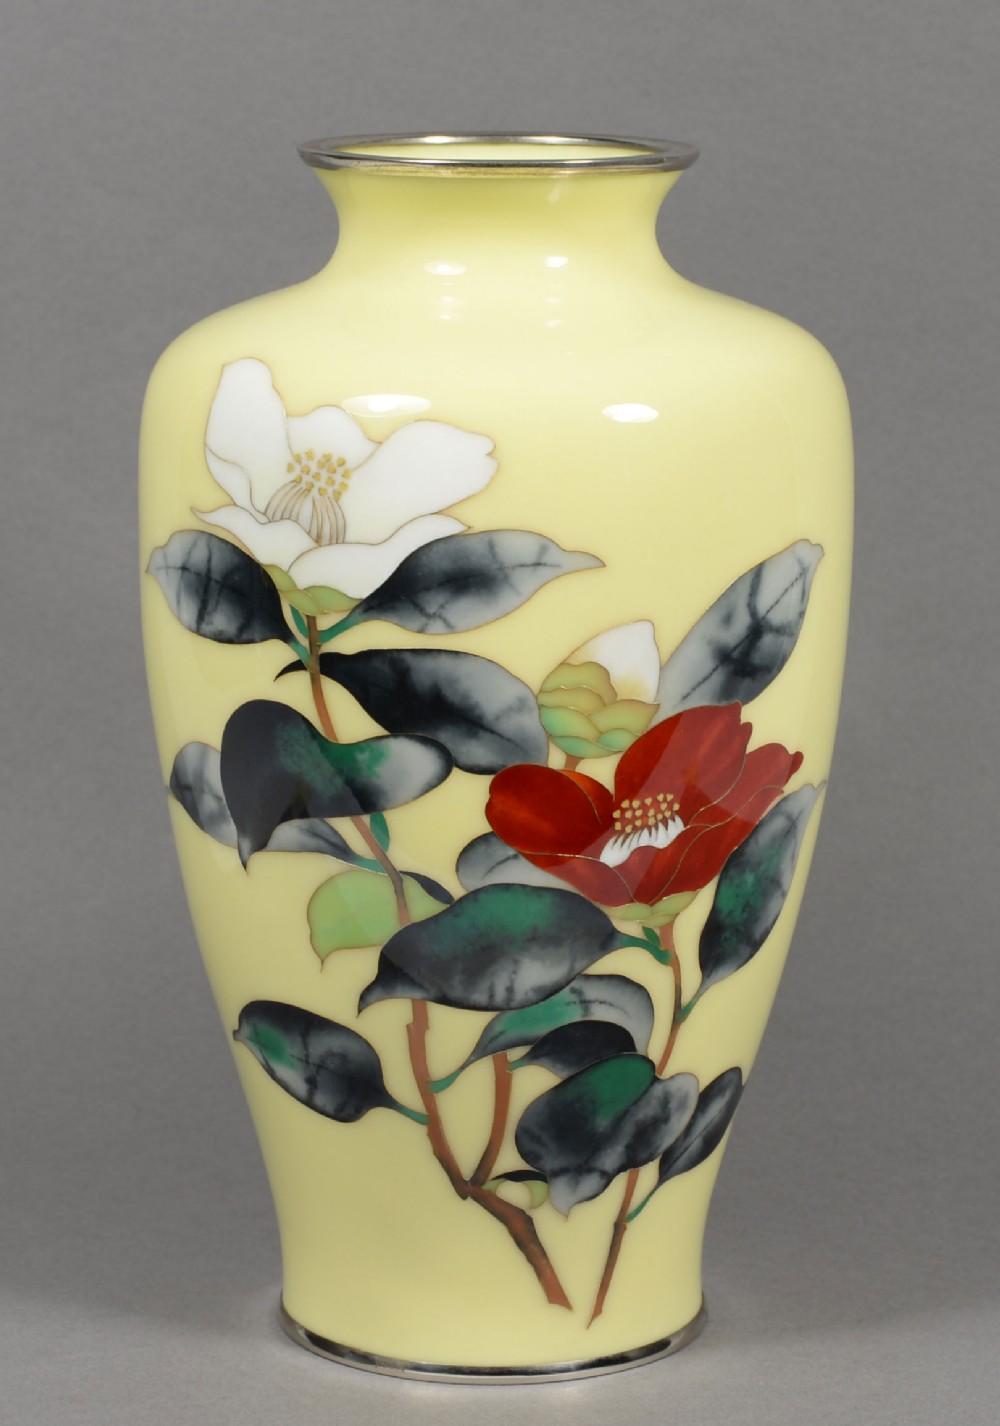 japanese cloisonne enamel floral vase by ando